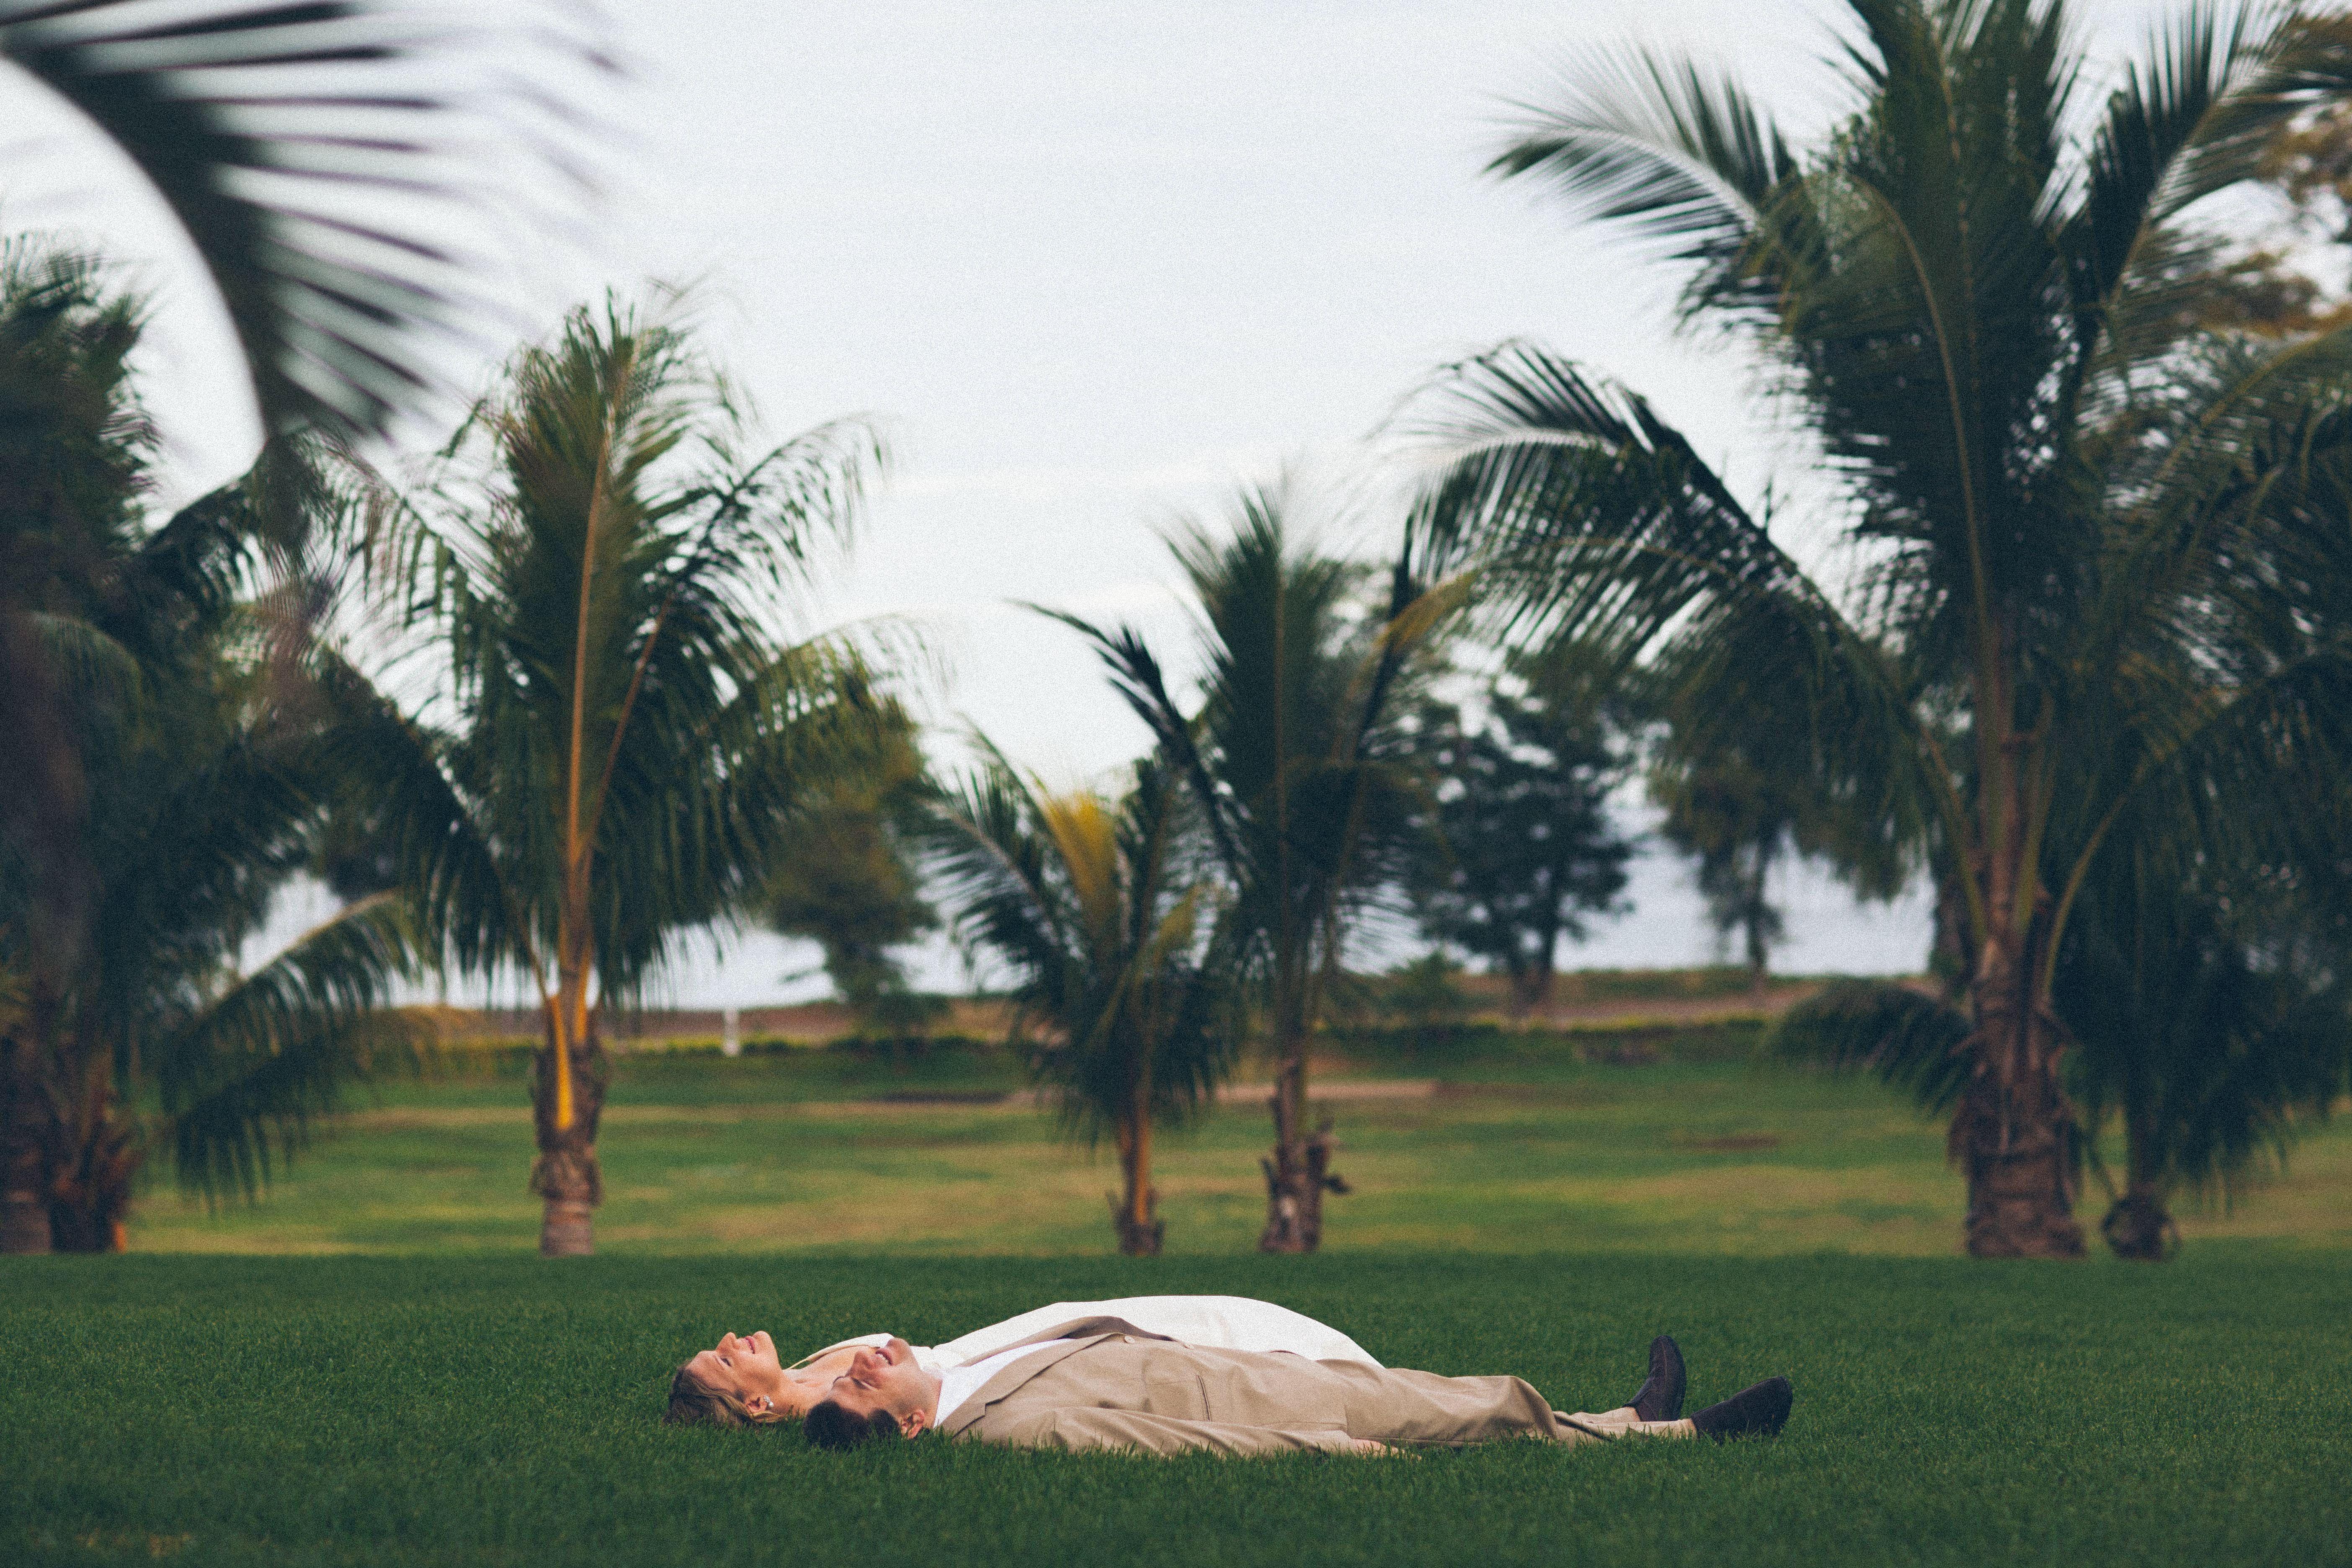 Visit www.weddingdaystory.com/blog for #destinationwedding pictures! Alone. RIU resorts, wedding photography. Photography by WeddingDayStory, Destination Wedding Photography in Mexico, Costa Rica and Dominican Republic! Celebrating the Simple Romance of Weddings in the Sun. Visit us!    www.weddingdaystory.com